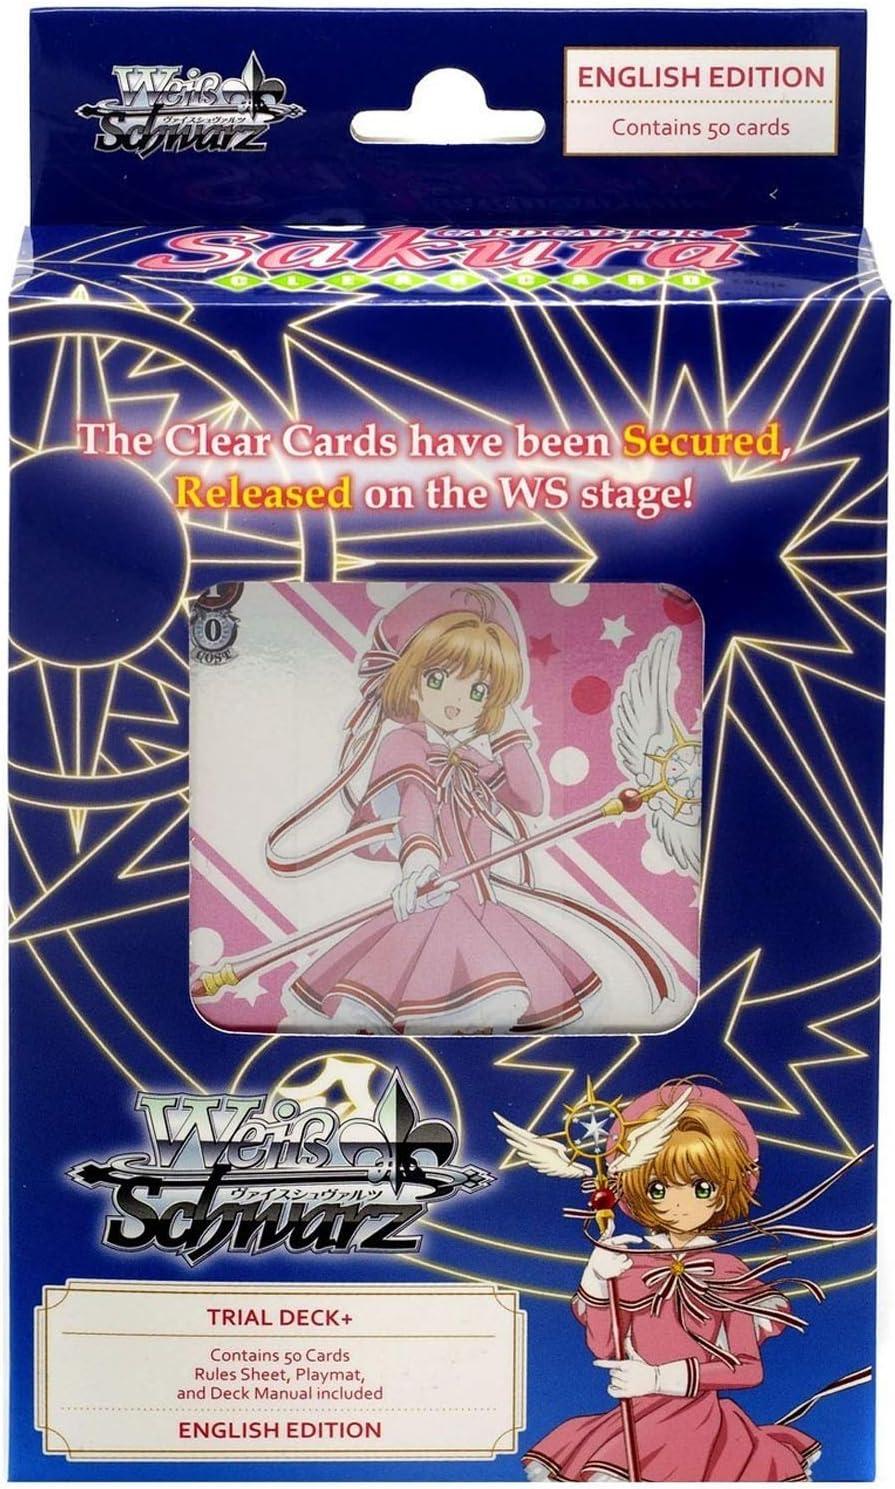 Weiss Schwarz 5 ☆ popular Cardcaptor Sakura Clear Gorgeous Trial Card Plus Deck